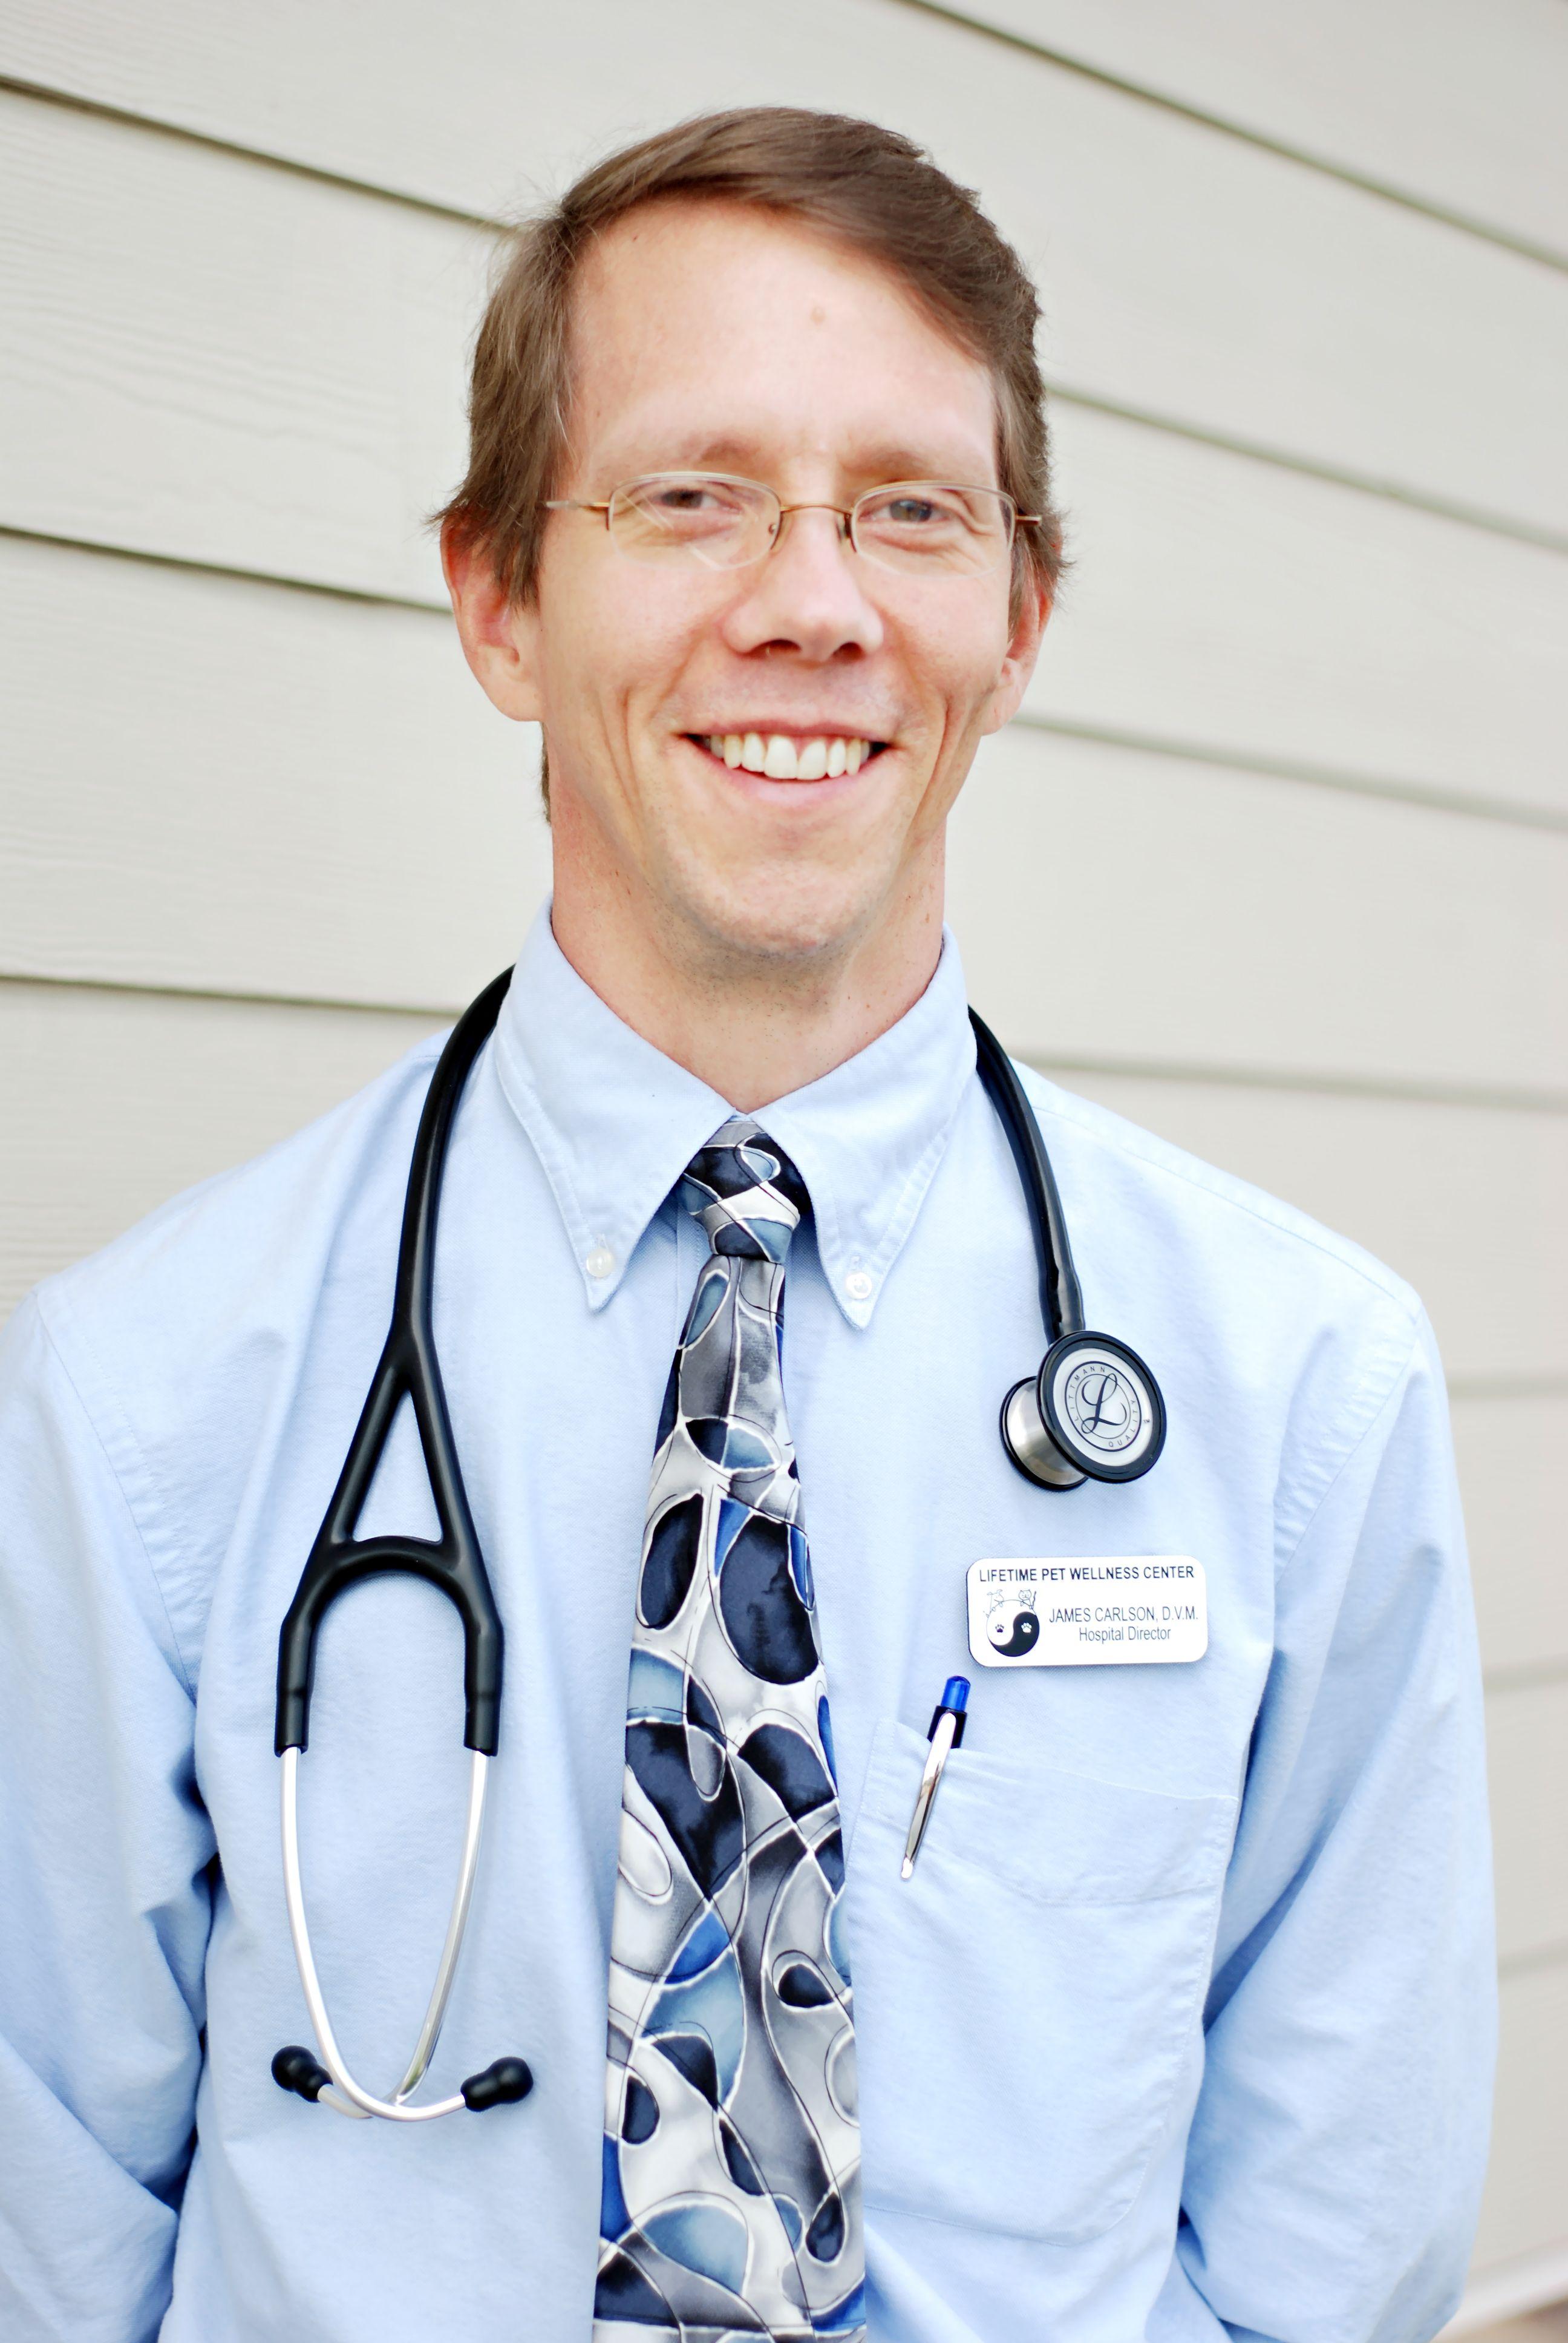 James Carlson Dvm Cva Cvsmt Lifetime Pet Wellness Center In Columbus Ohio Pet Wellness Pet Clinic Veterinary Services